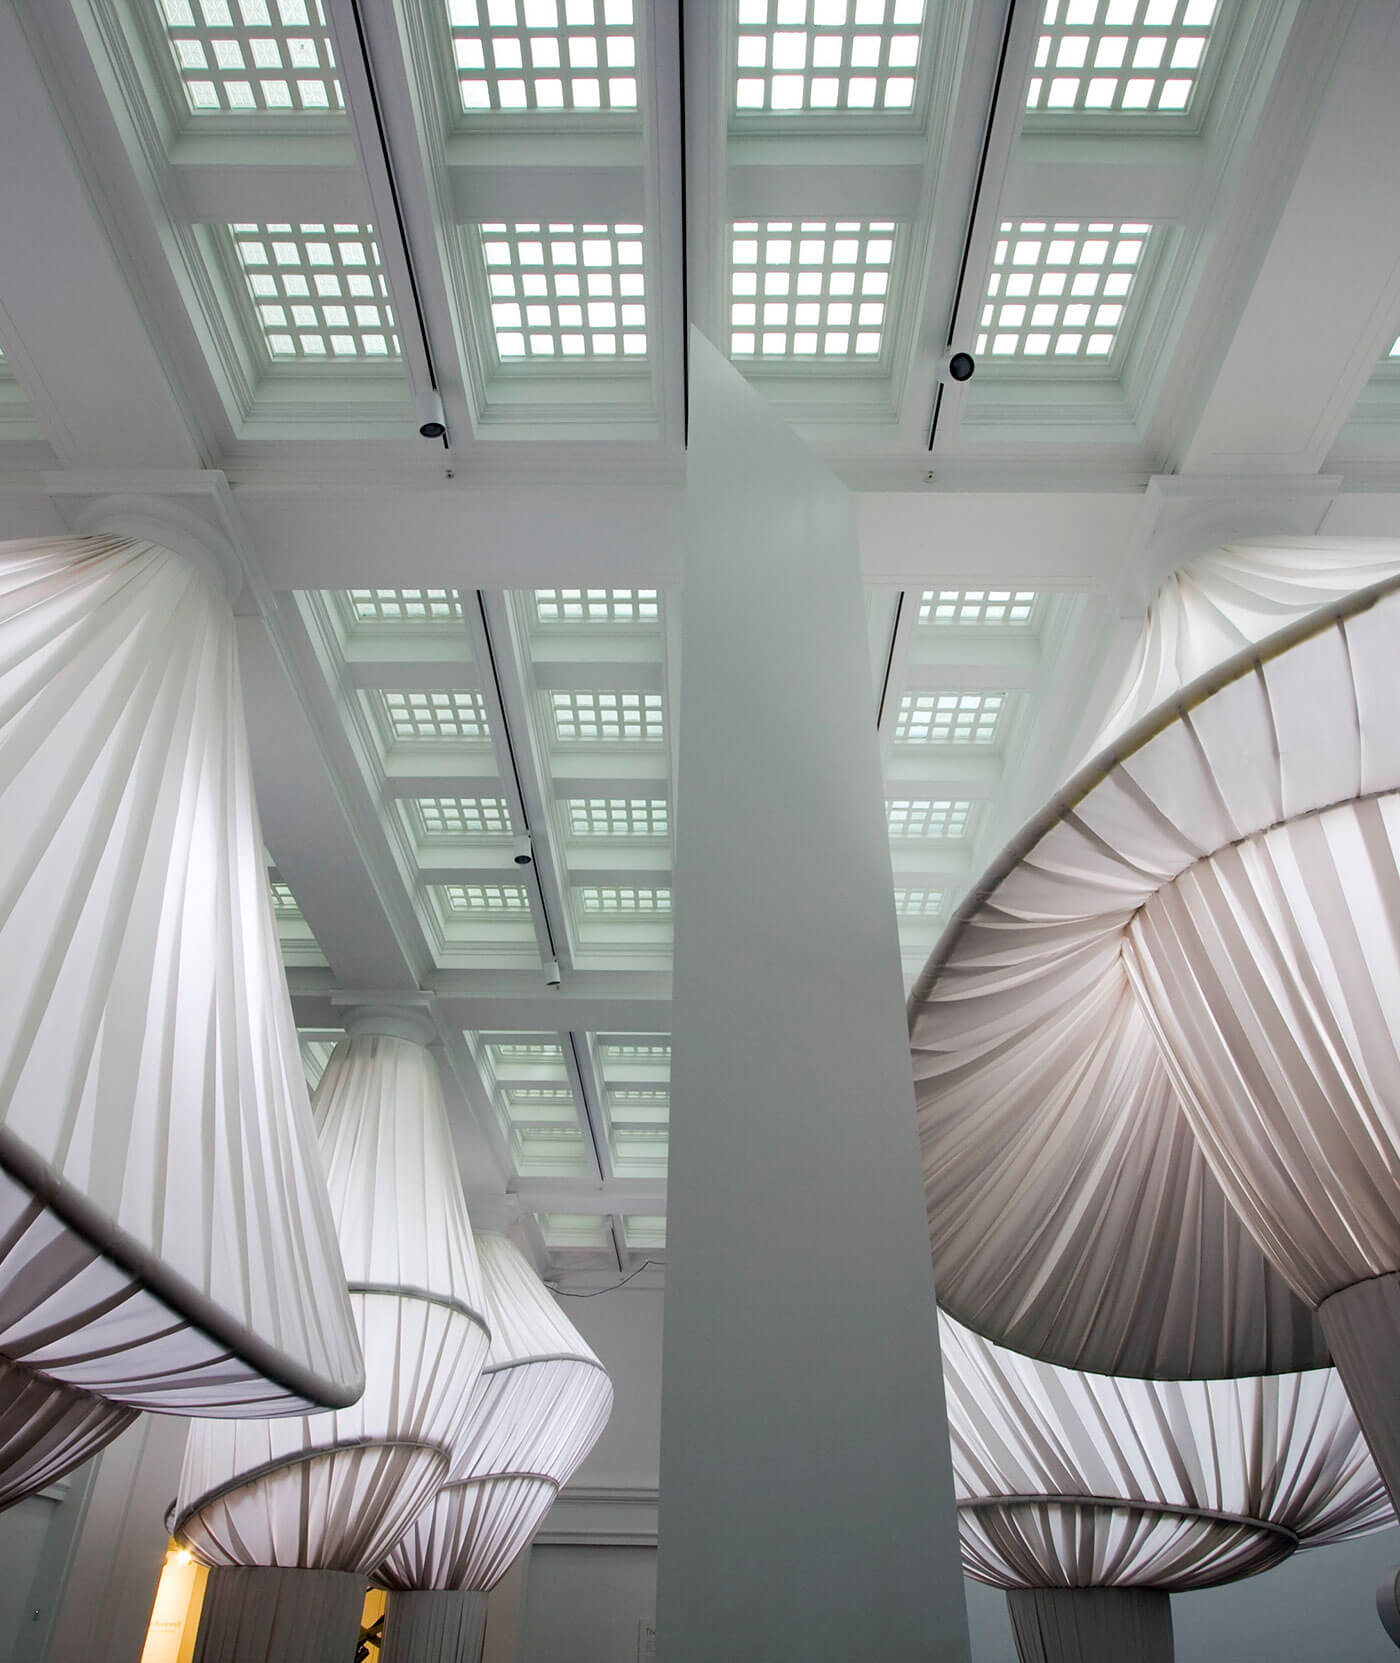 The reOrder exhbit at the Brooklyn Museum created art using 2000 yards of Sunbrella fabrics